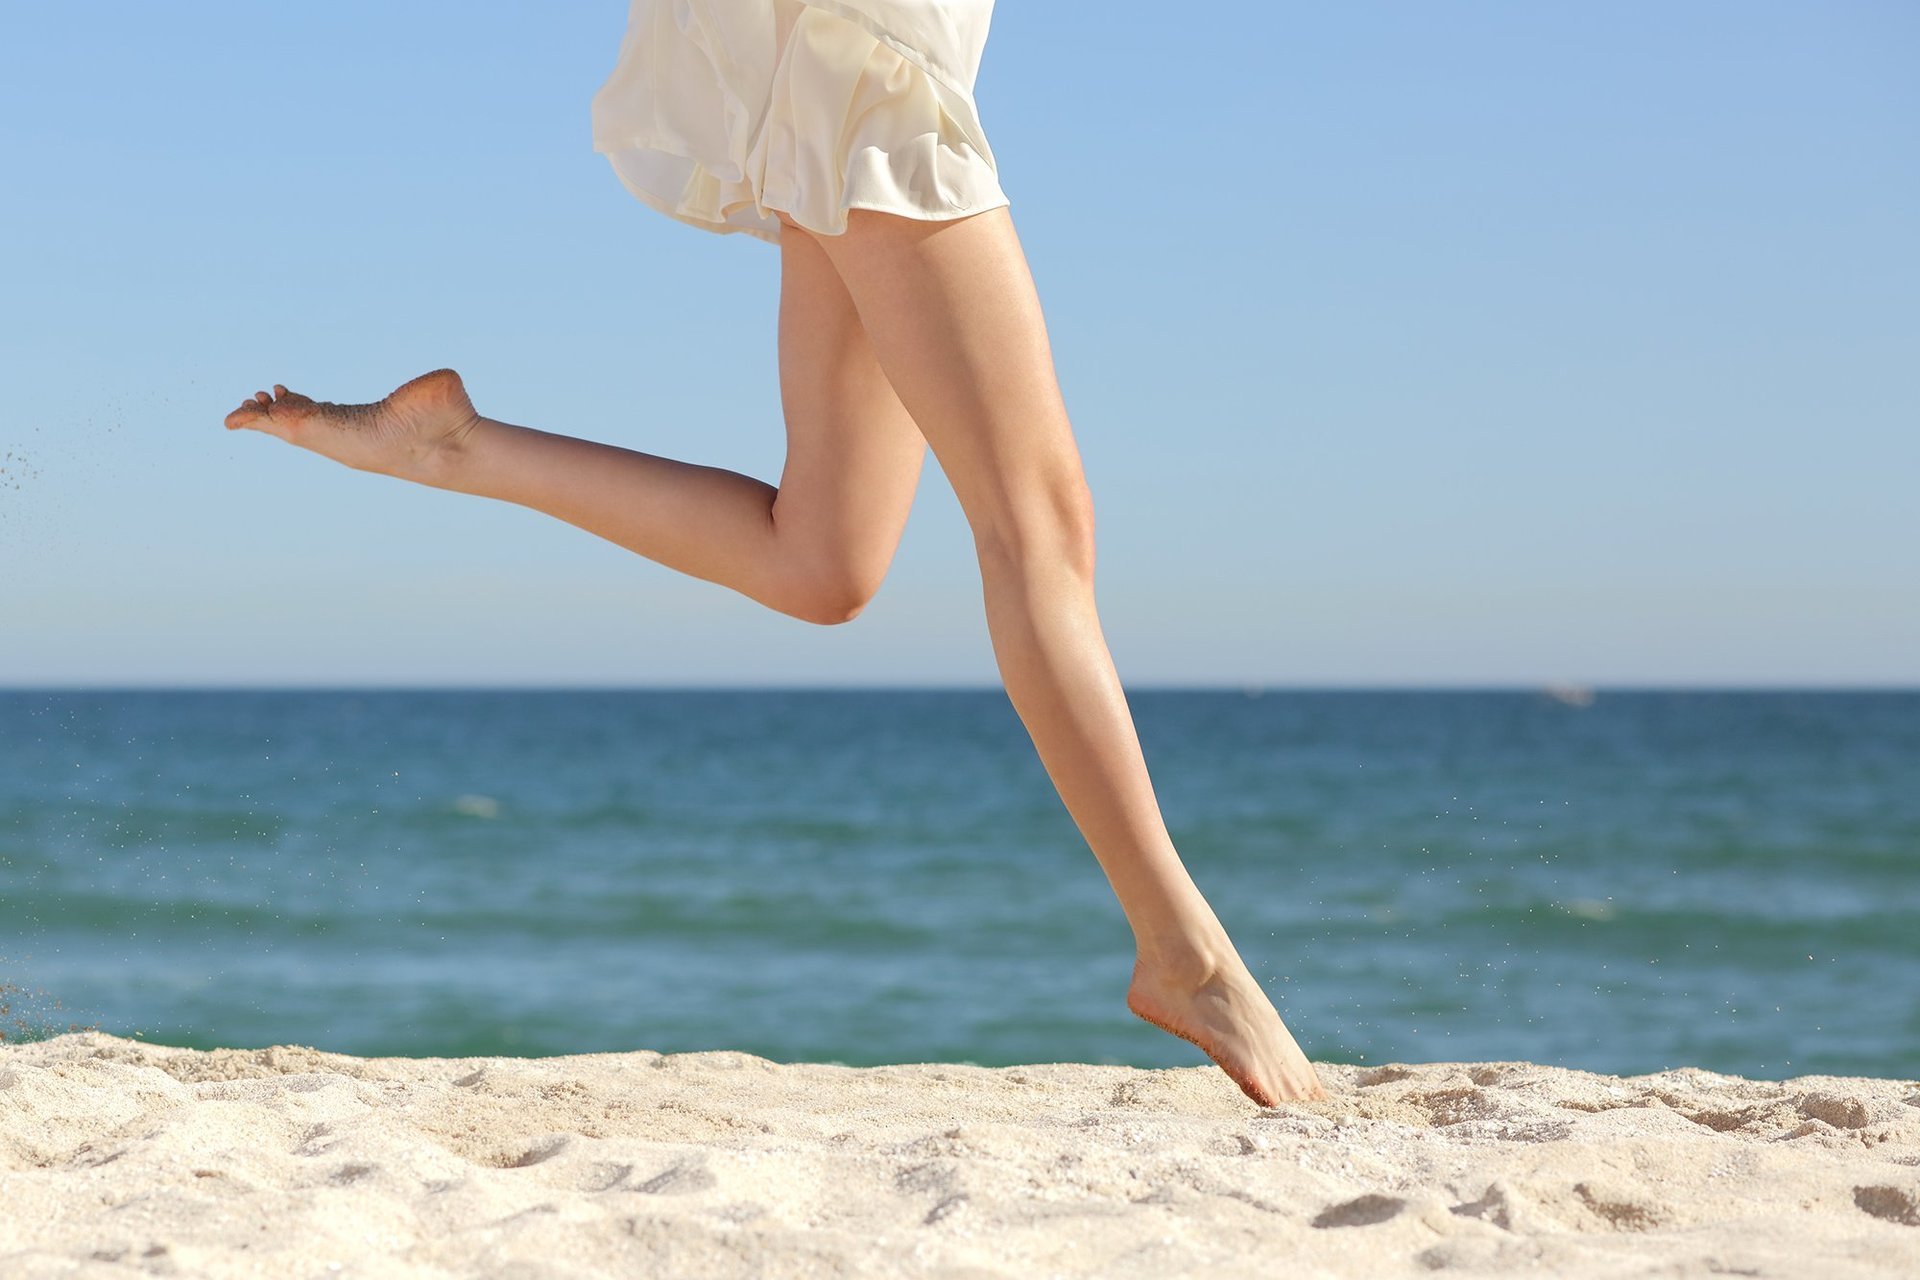 lady jumping at a beach